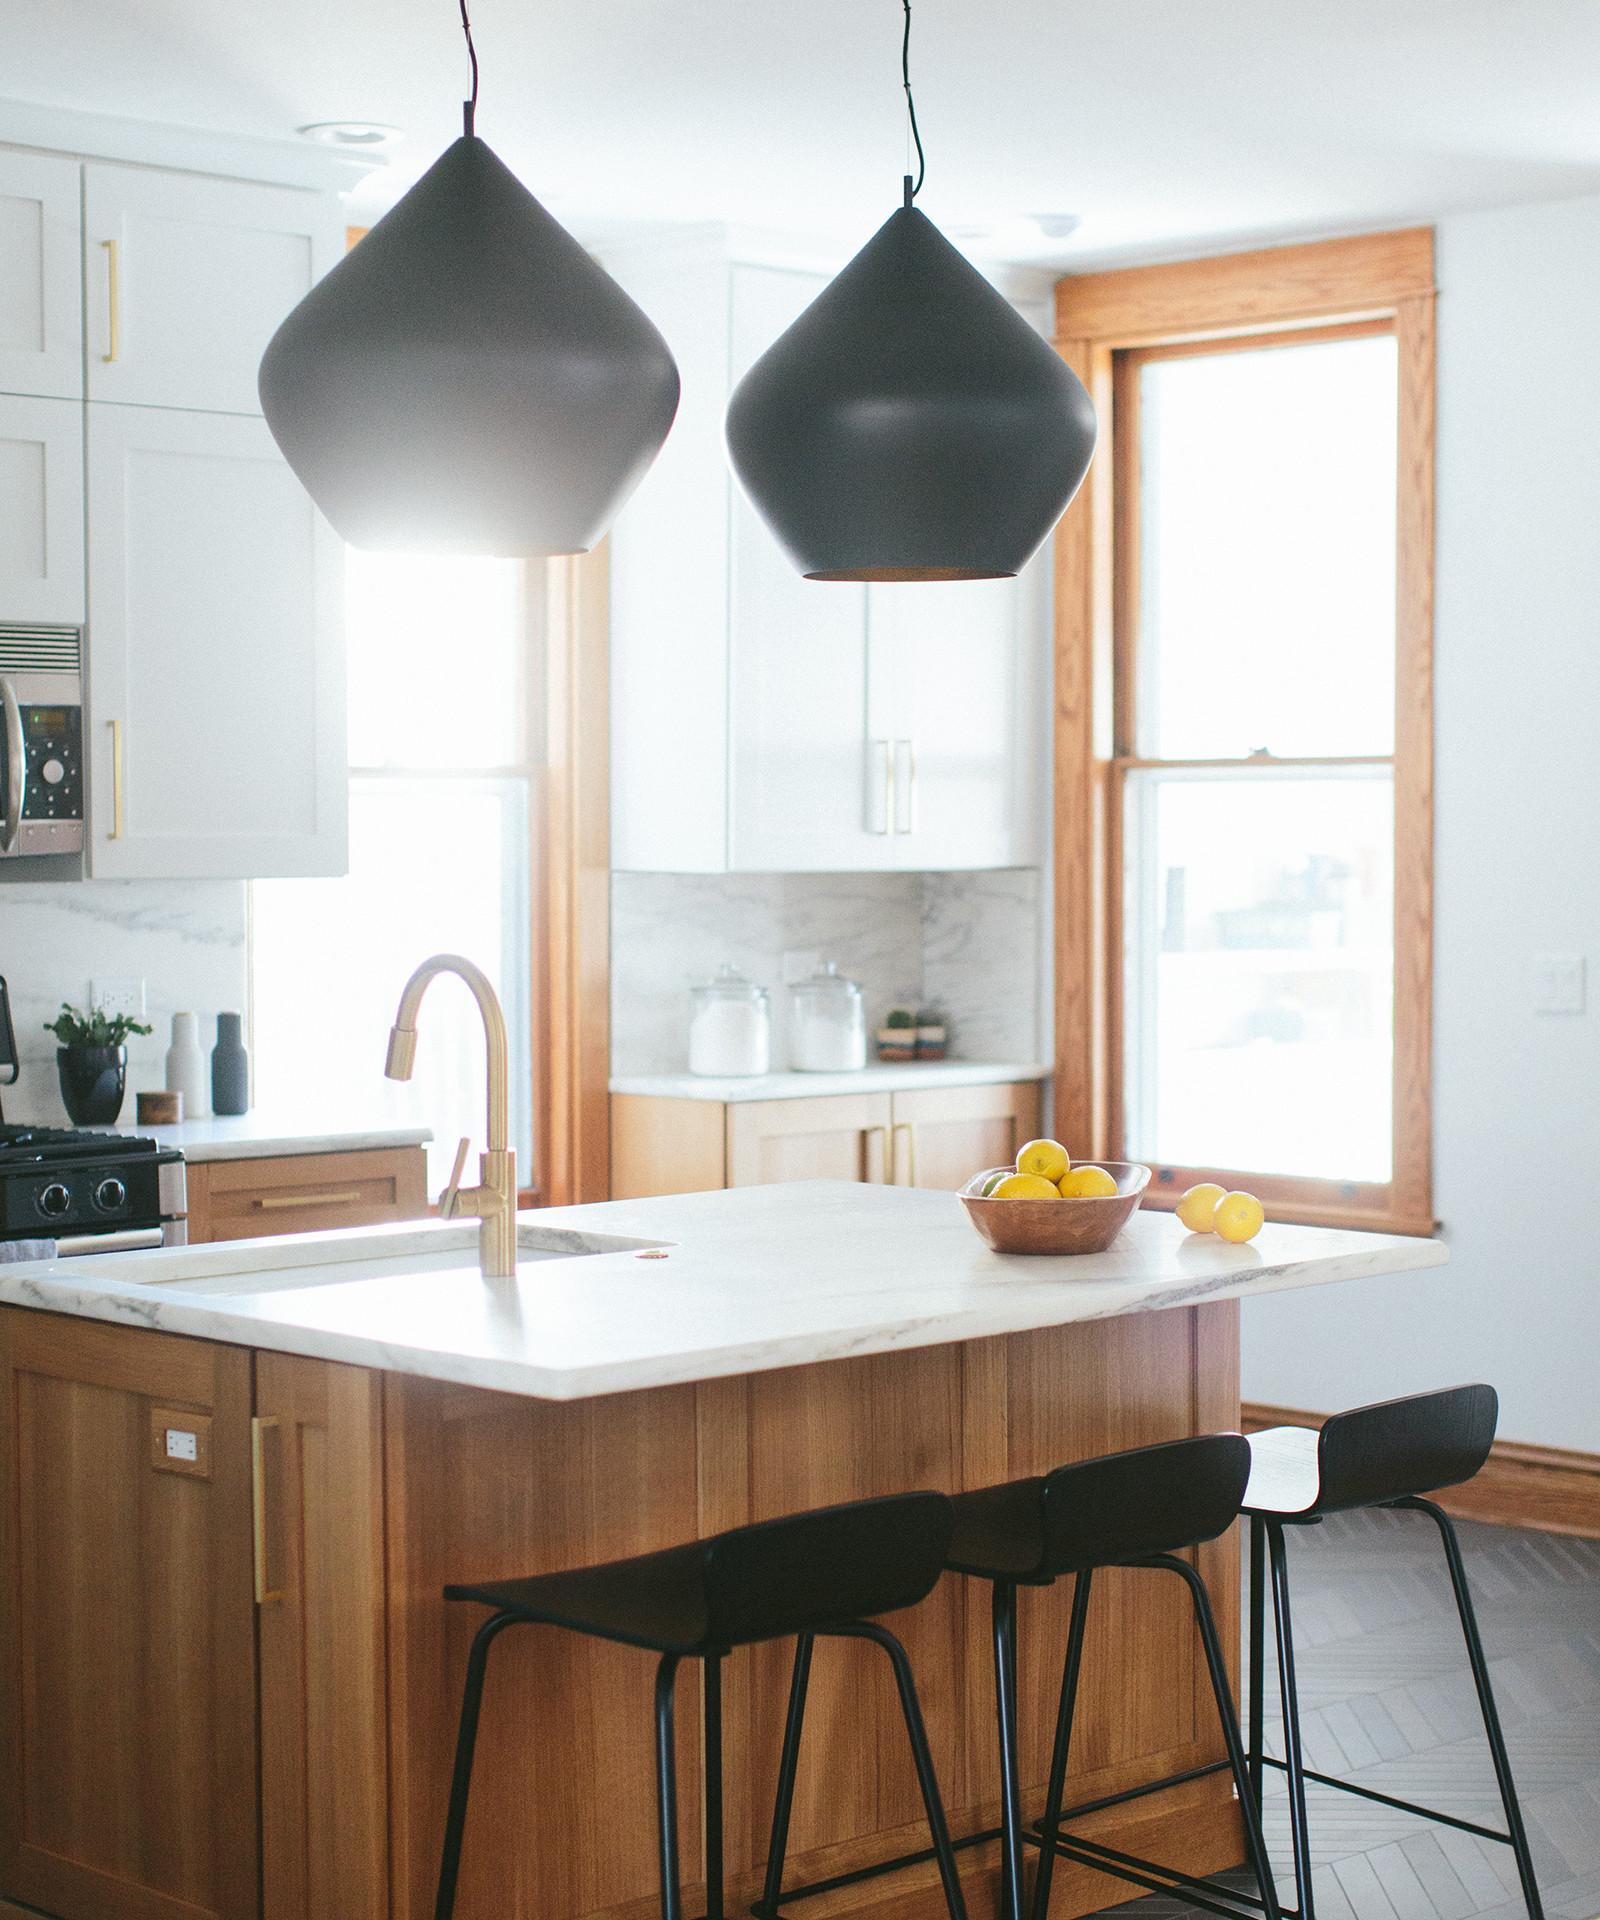 Modern Vintage Residential Kitchen Lighting | Kuchar